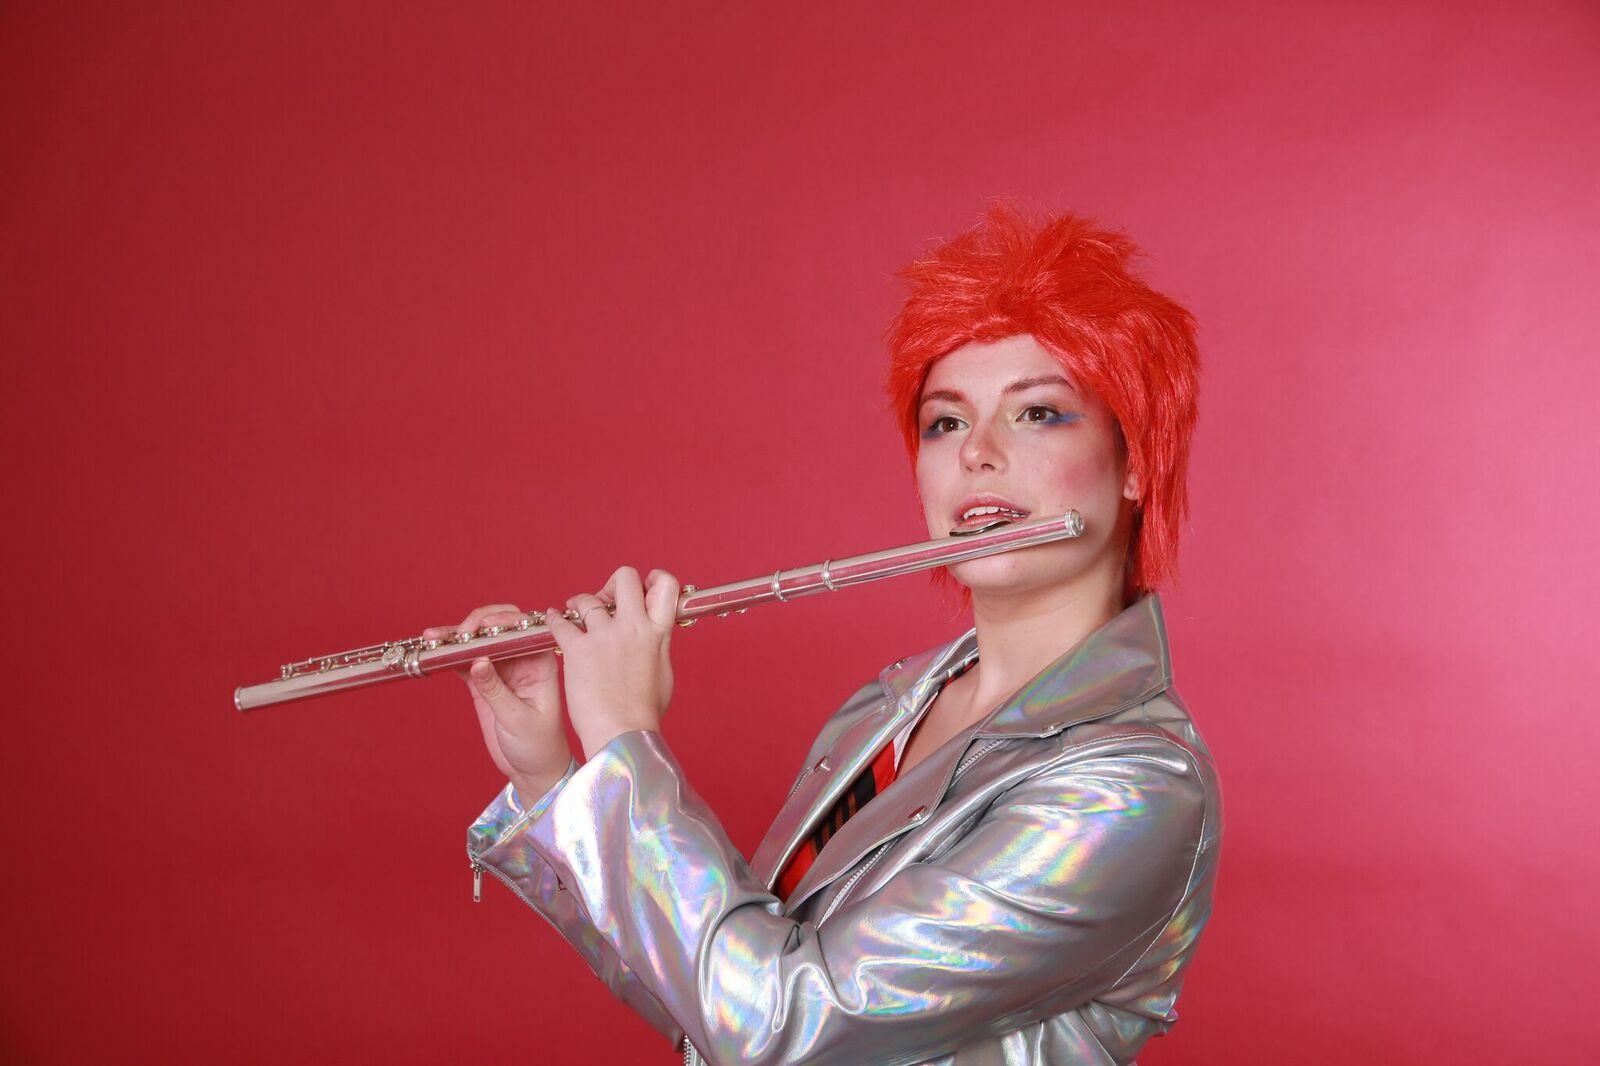 David Bowie ED_500.jpeg